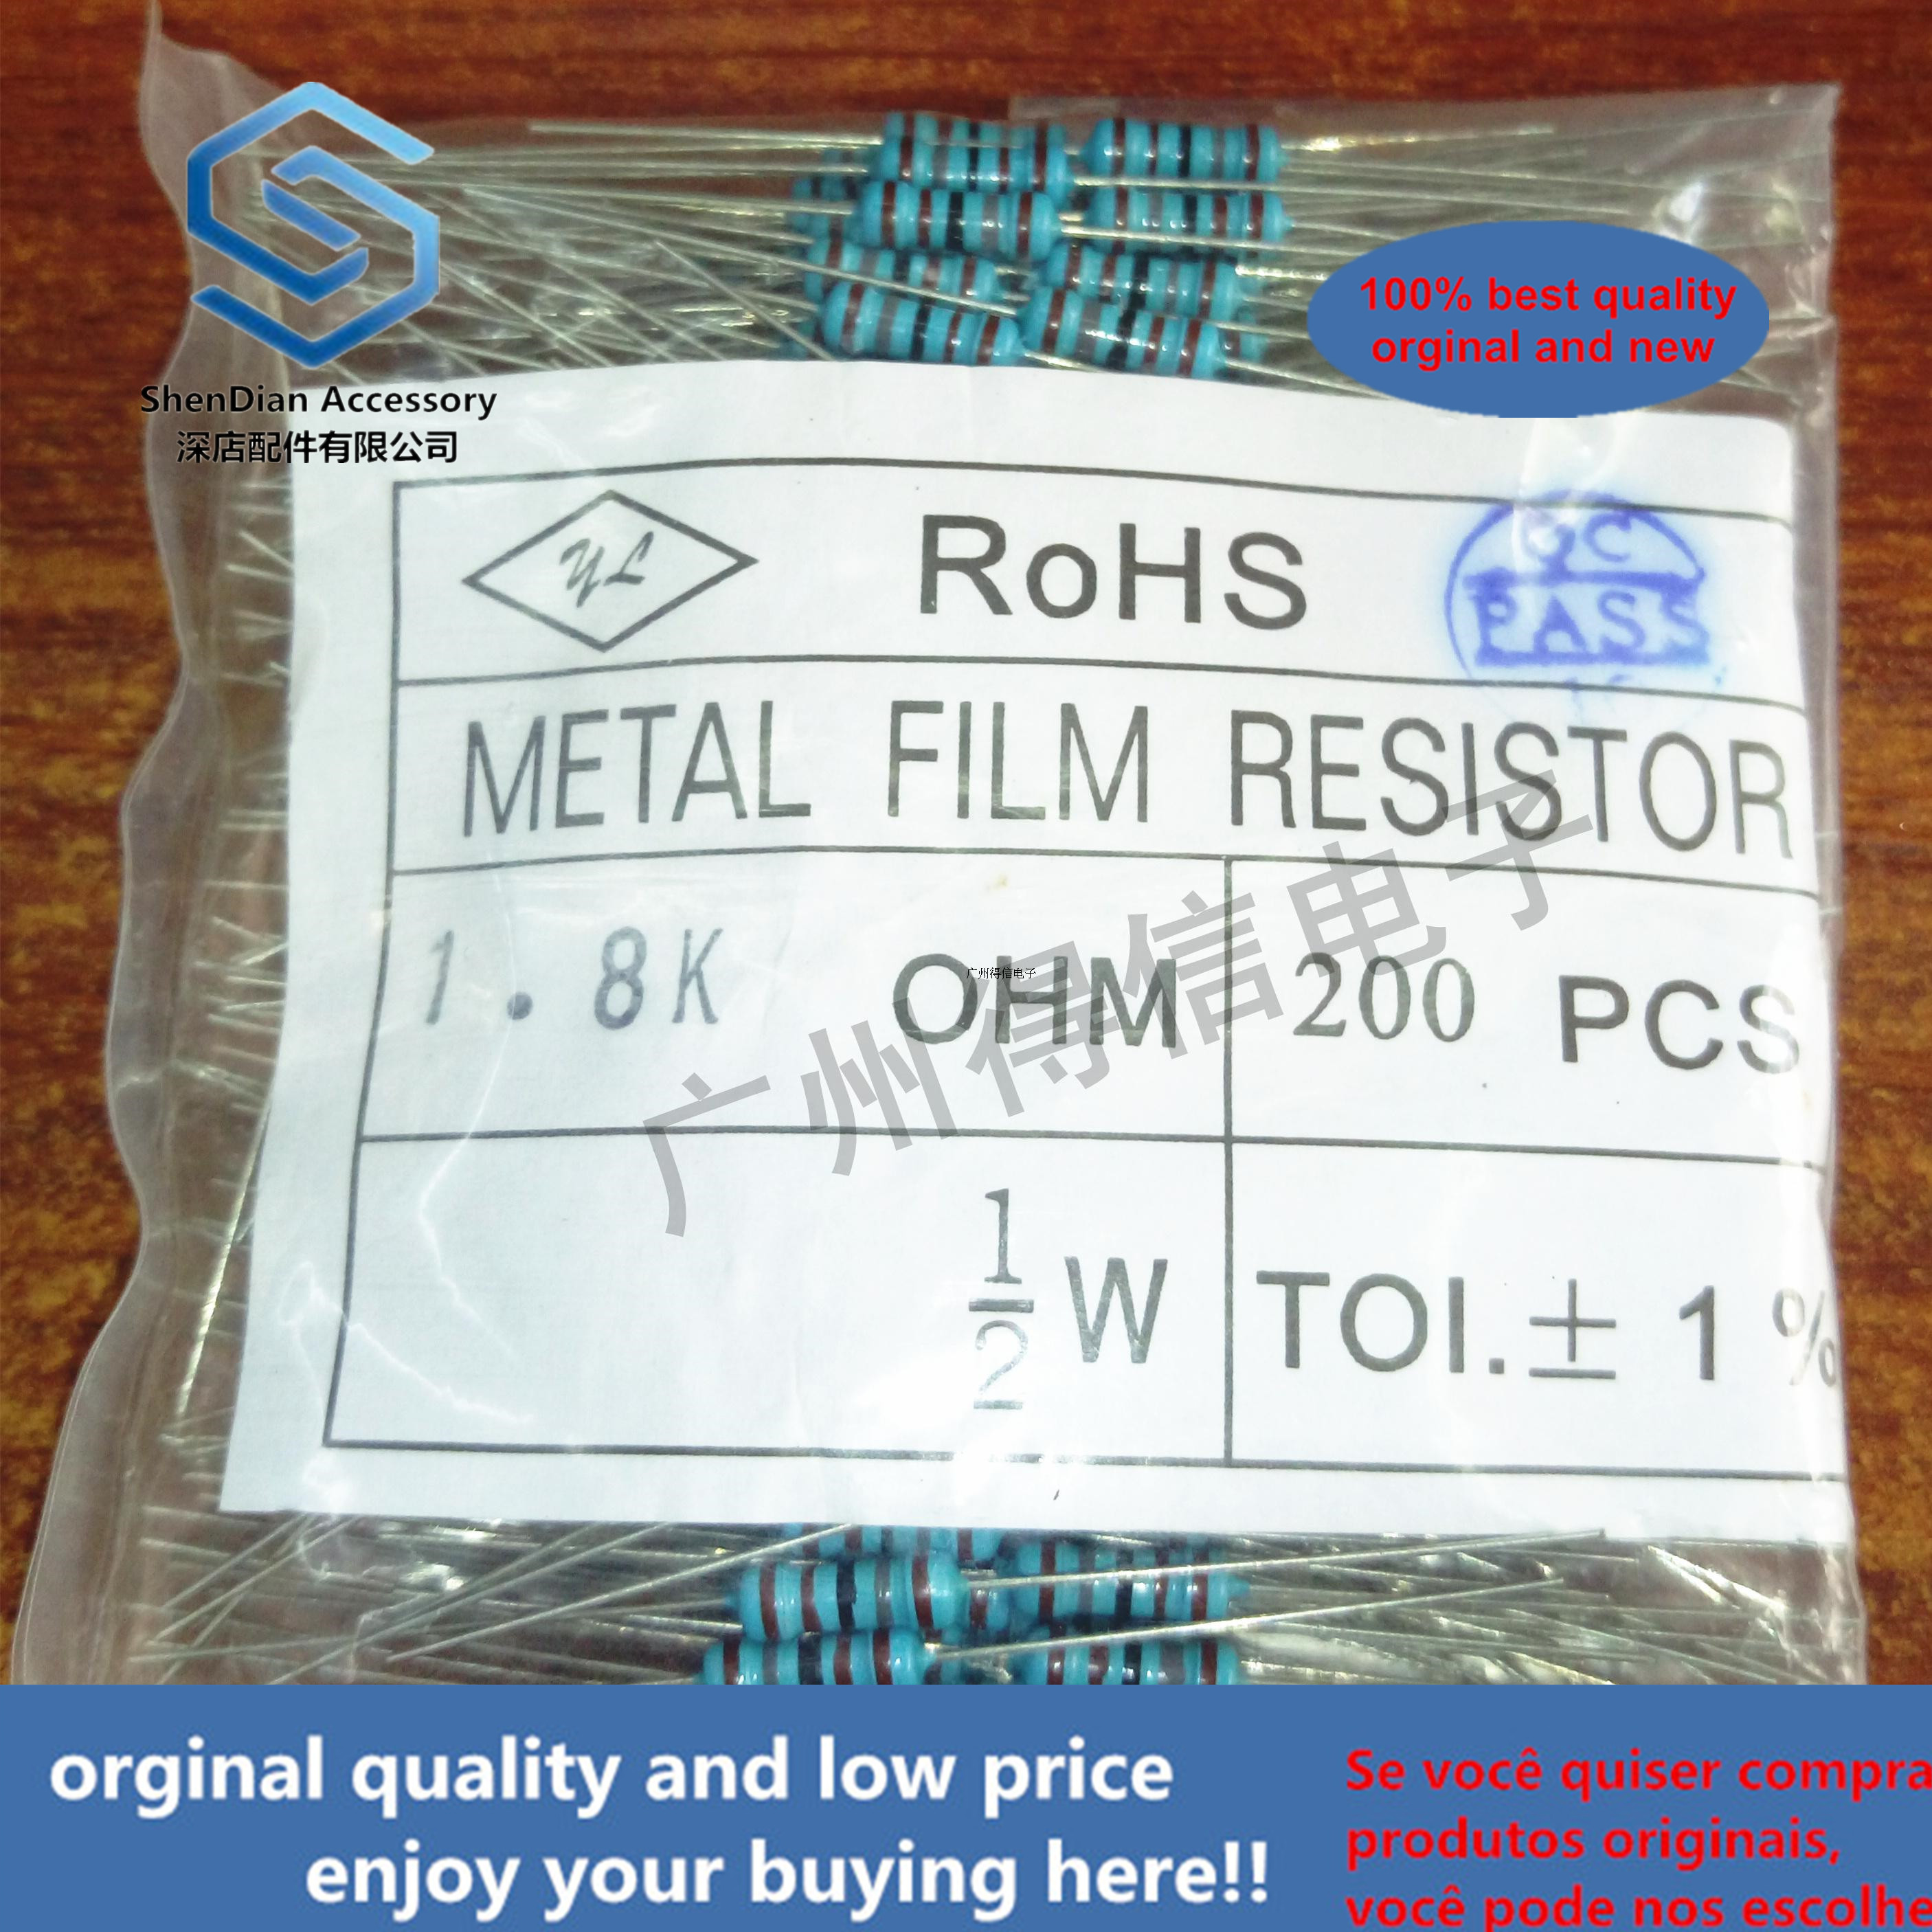 200pcs 1 / 2W 13K 1% Brand New Metal Film Iron Feet Resistor Bag 200 Pcs Per Pack